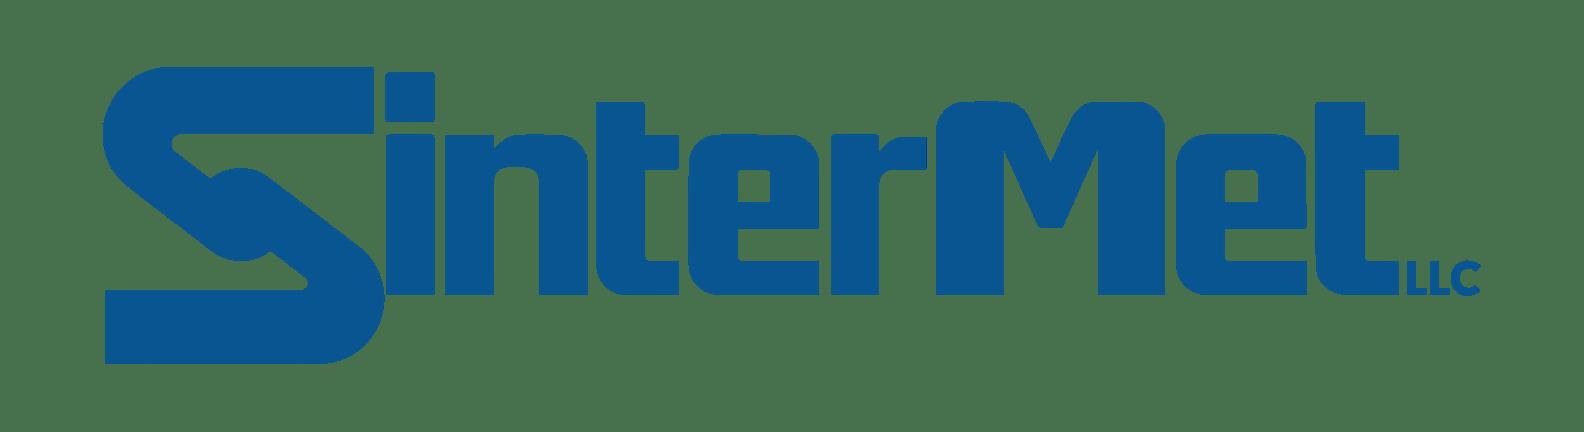 SinterMet company logo